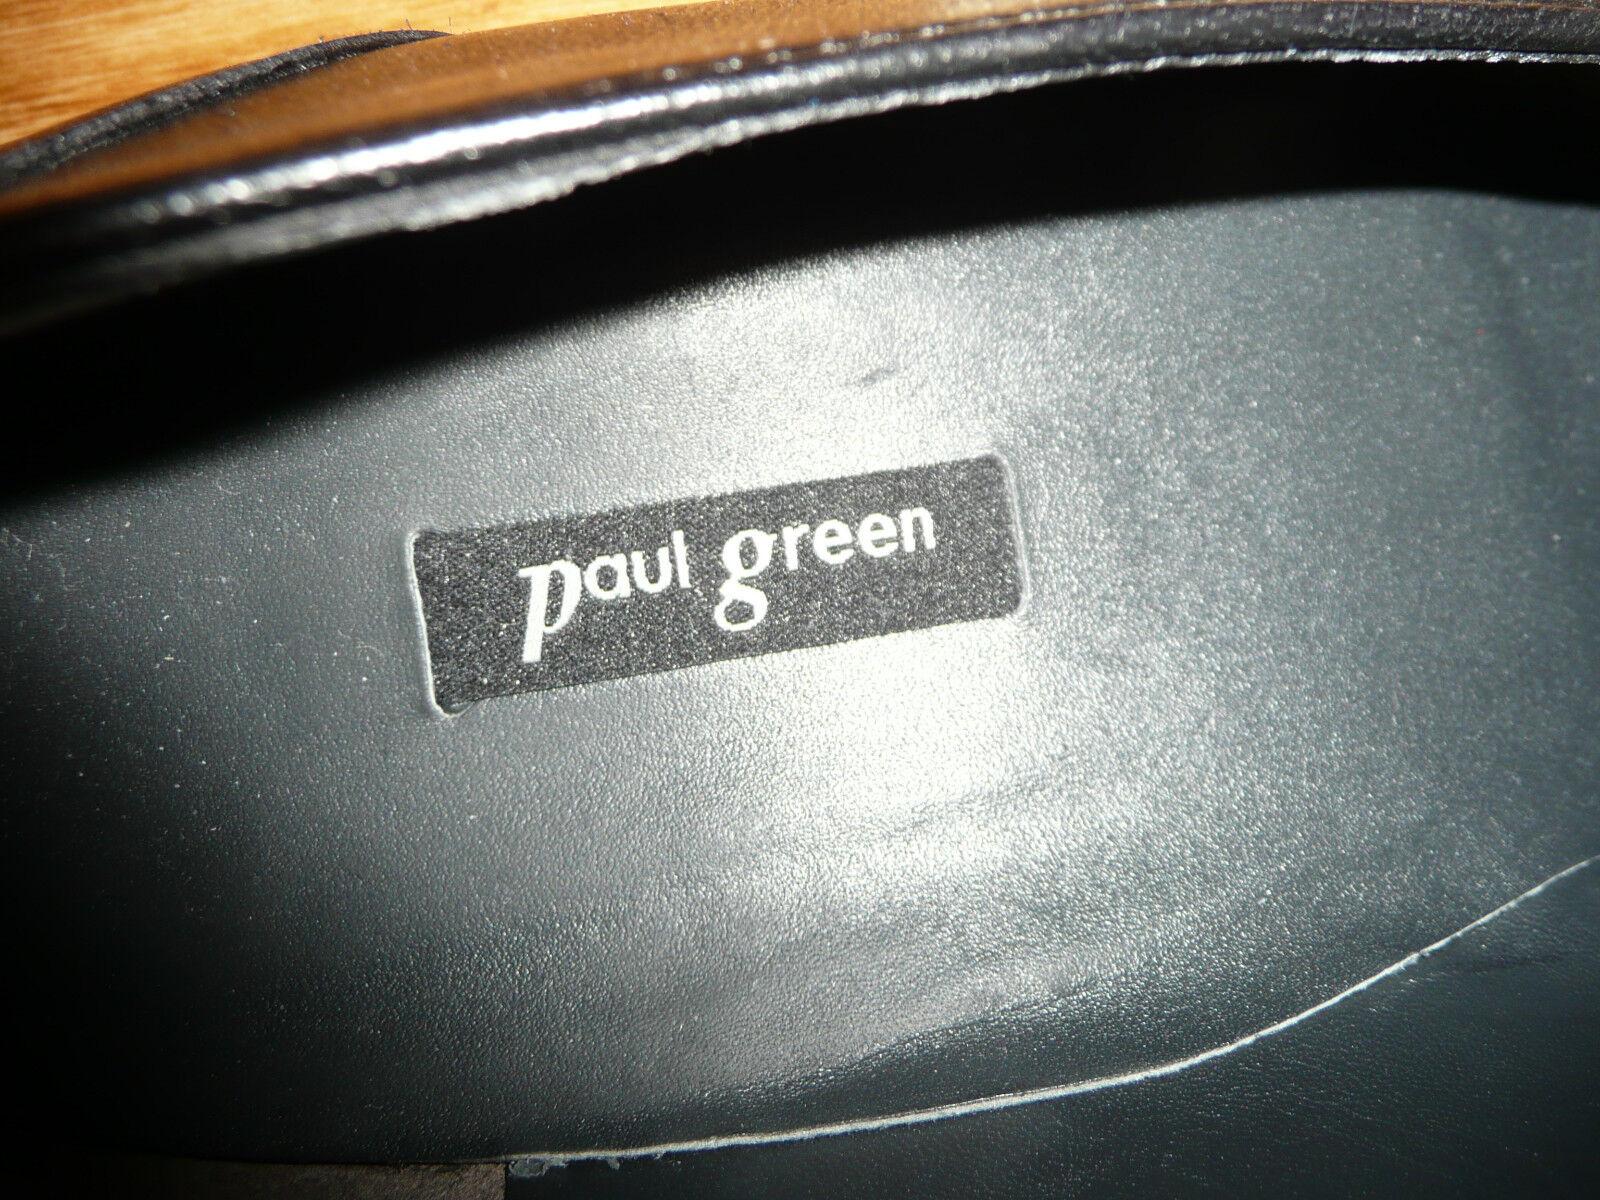 PAUL TOLL GREEN SCHUHE NEU TOLL PAUL 56b7e9